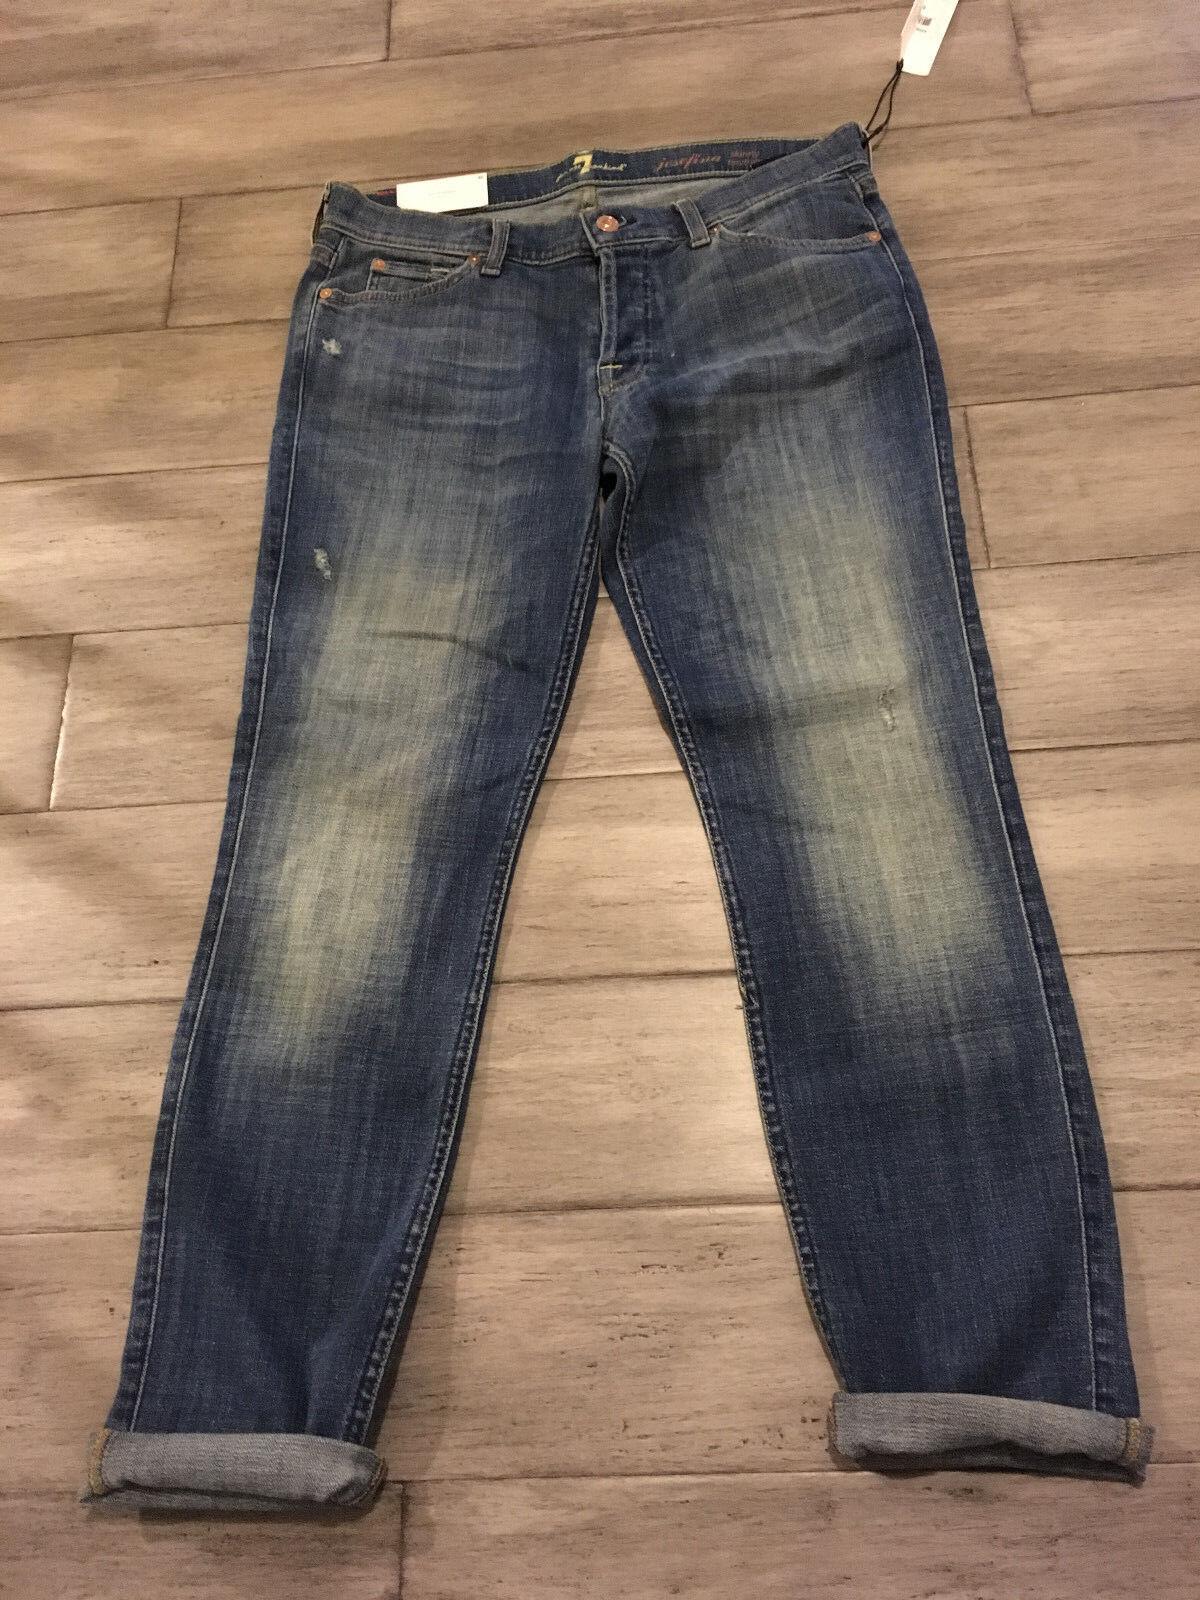 7 For All Mankind Josefina Skinny Boyfriend Medium Wash Denim Jeans Size 30 NWT